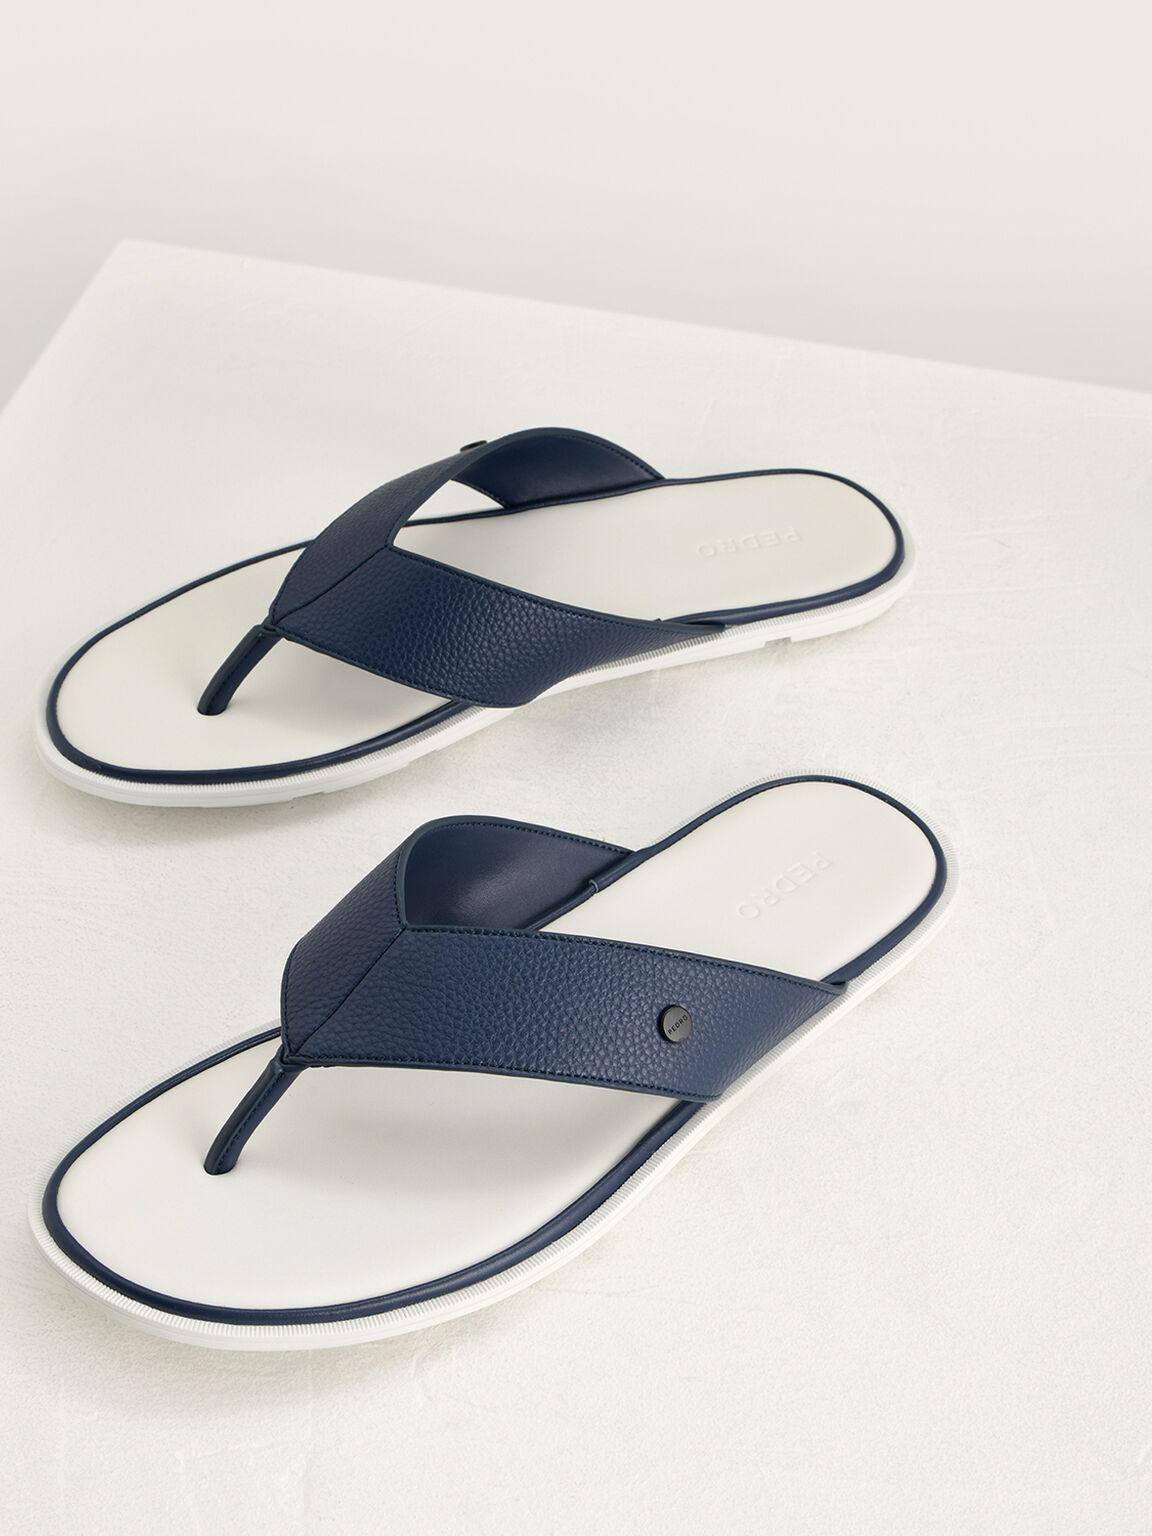 Casual Thong Sandals, Navy, hi-res